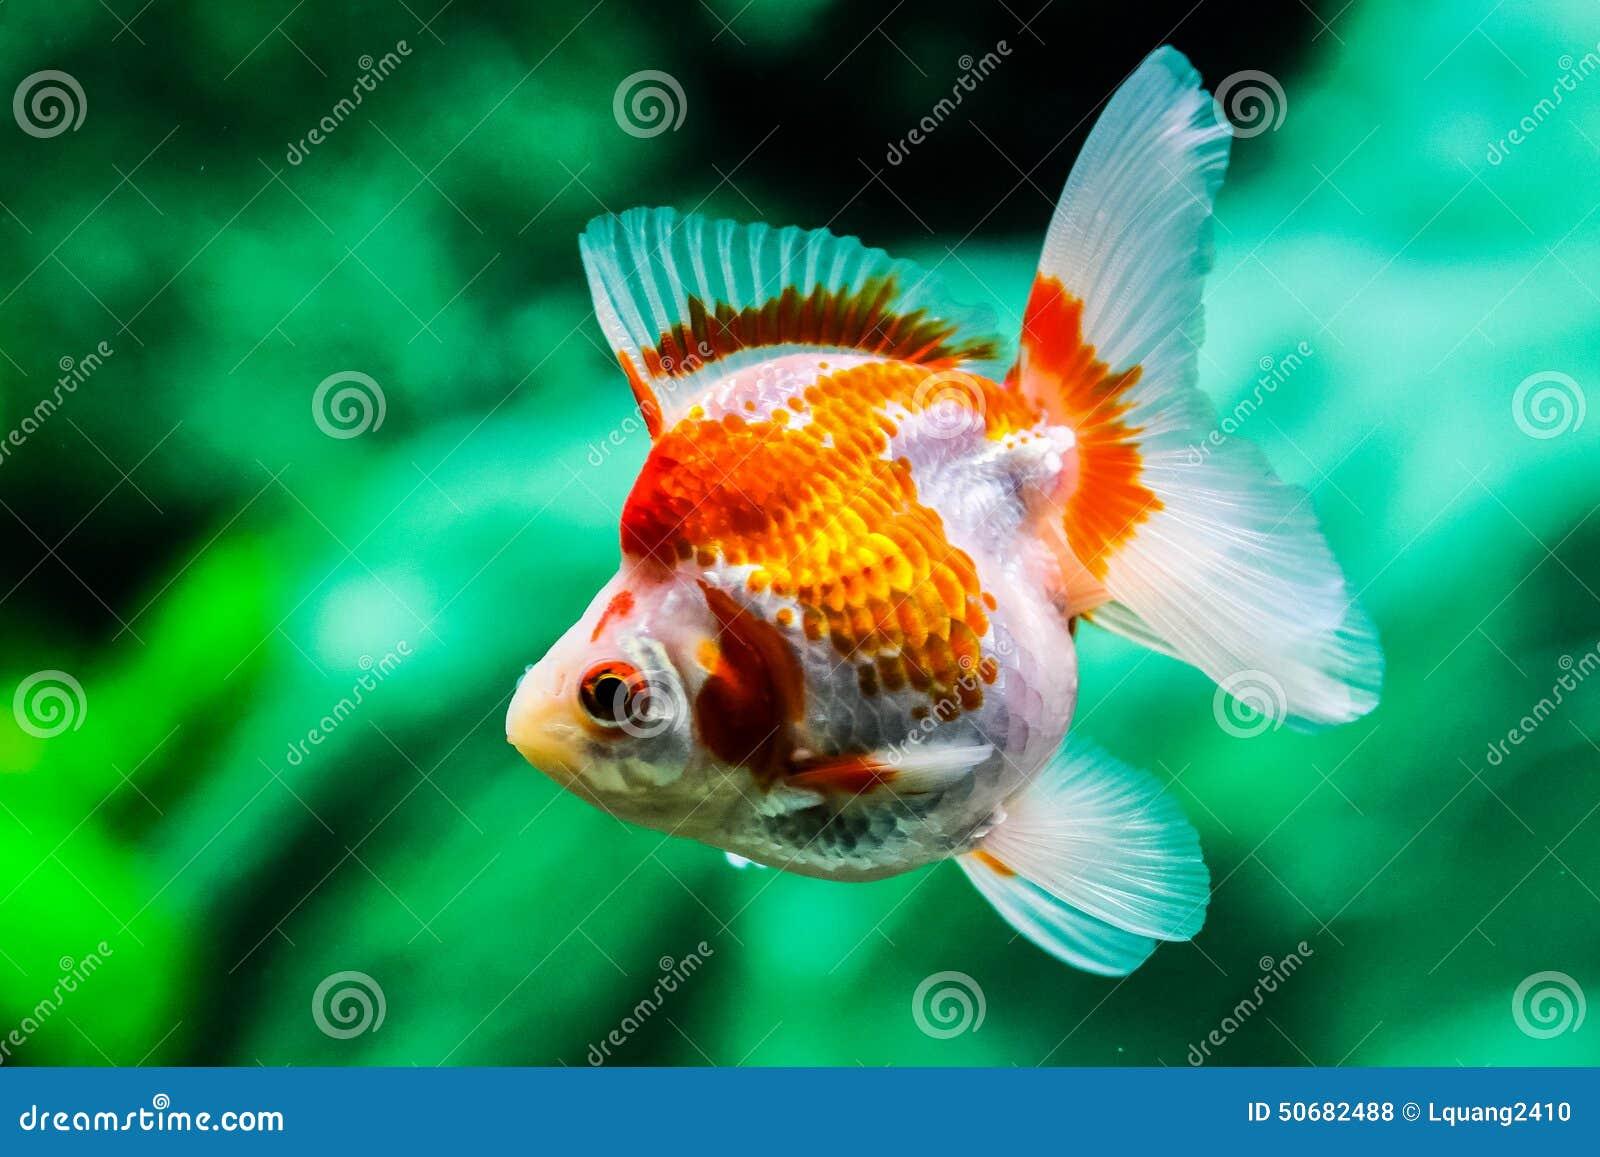 Download 关闭在水族馆的金鱼 库存照片. 图片 包括有 结算, 移动, 金鱼, 行动, bubblegum, 绿色 - 50682488